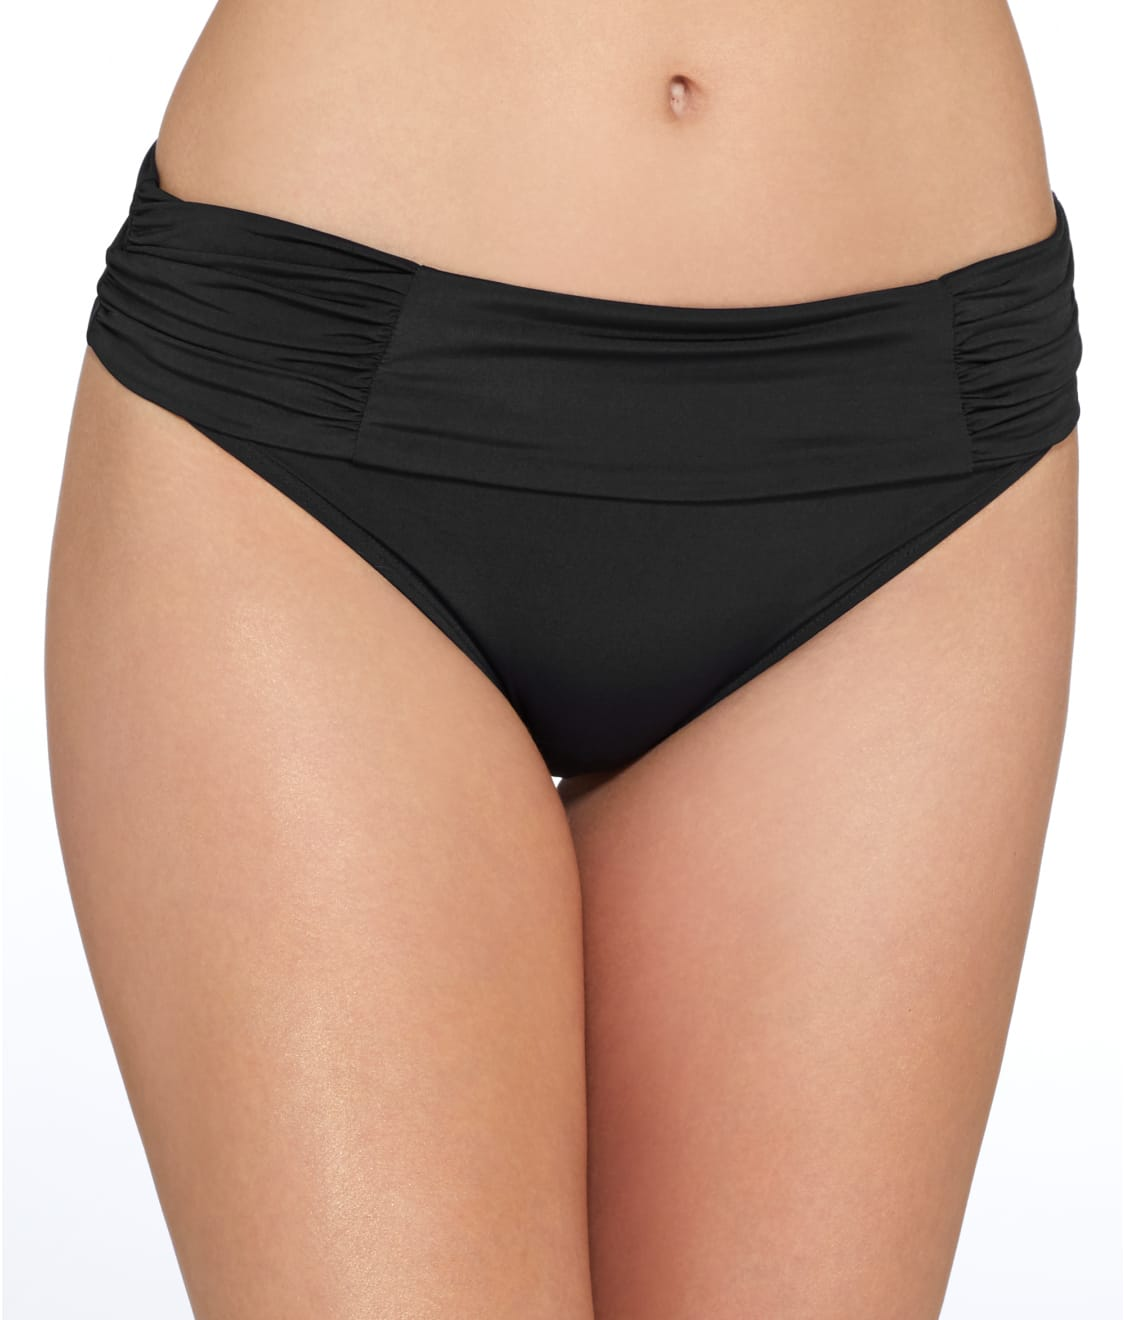 788ad5fe1f1e9 Panache Marina Fold-Over Bikini Bottom